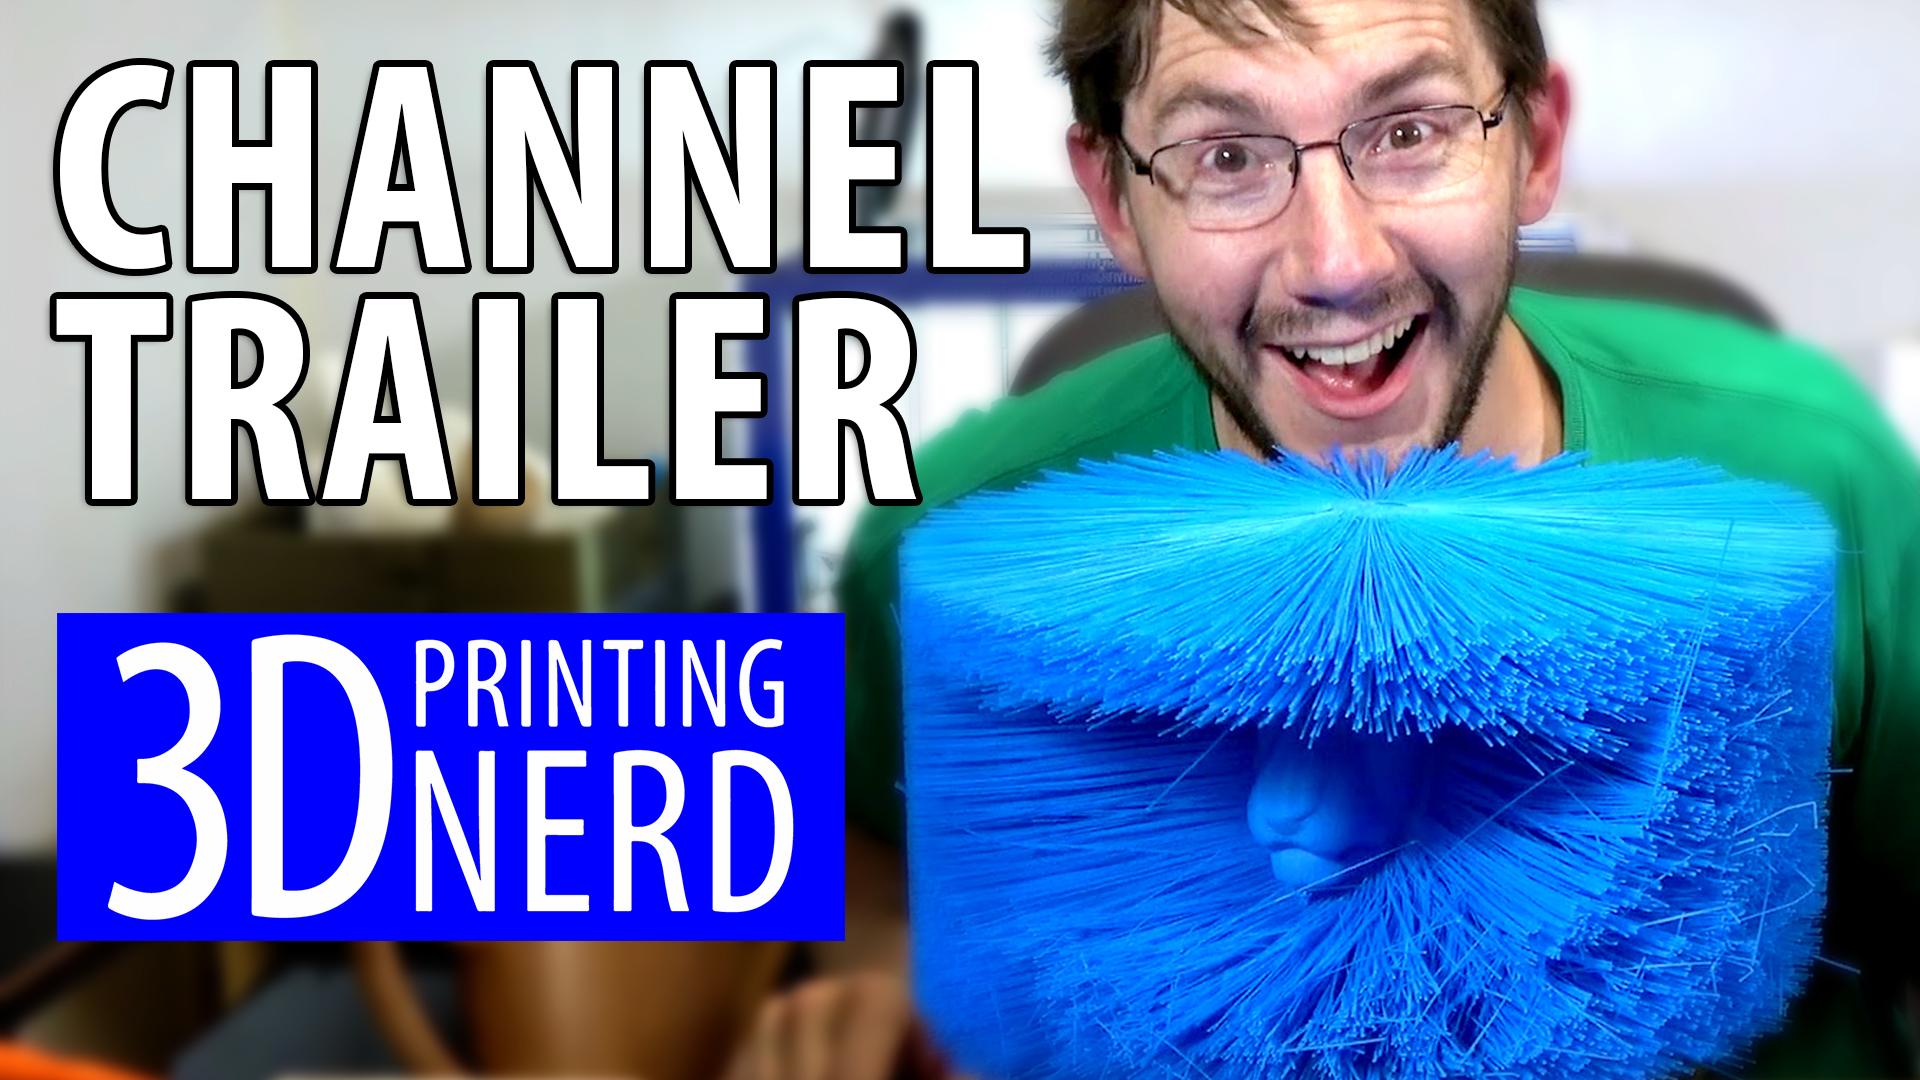 3D Printing Nerd Trailer